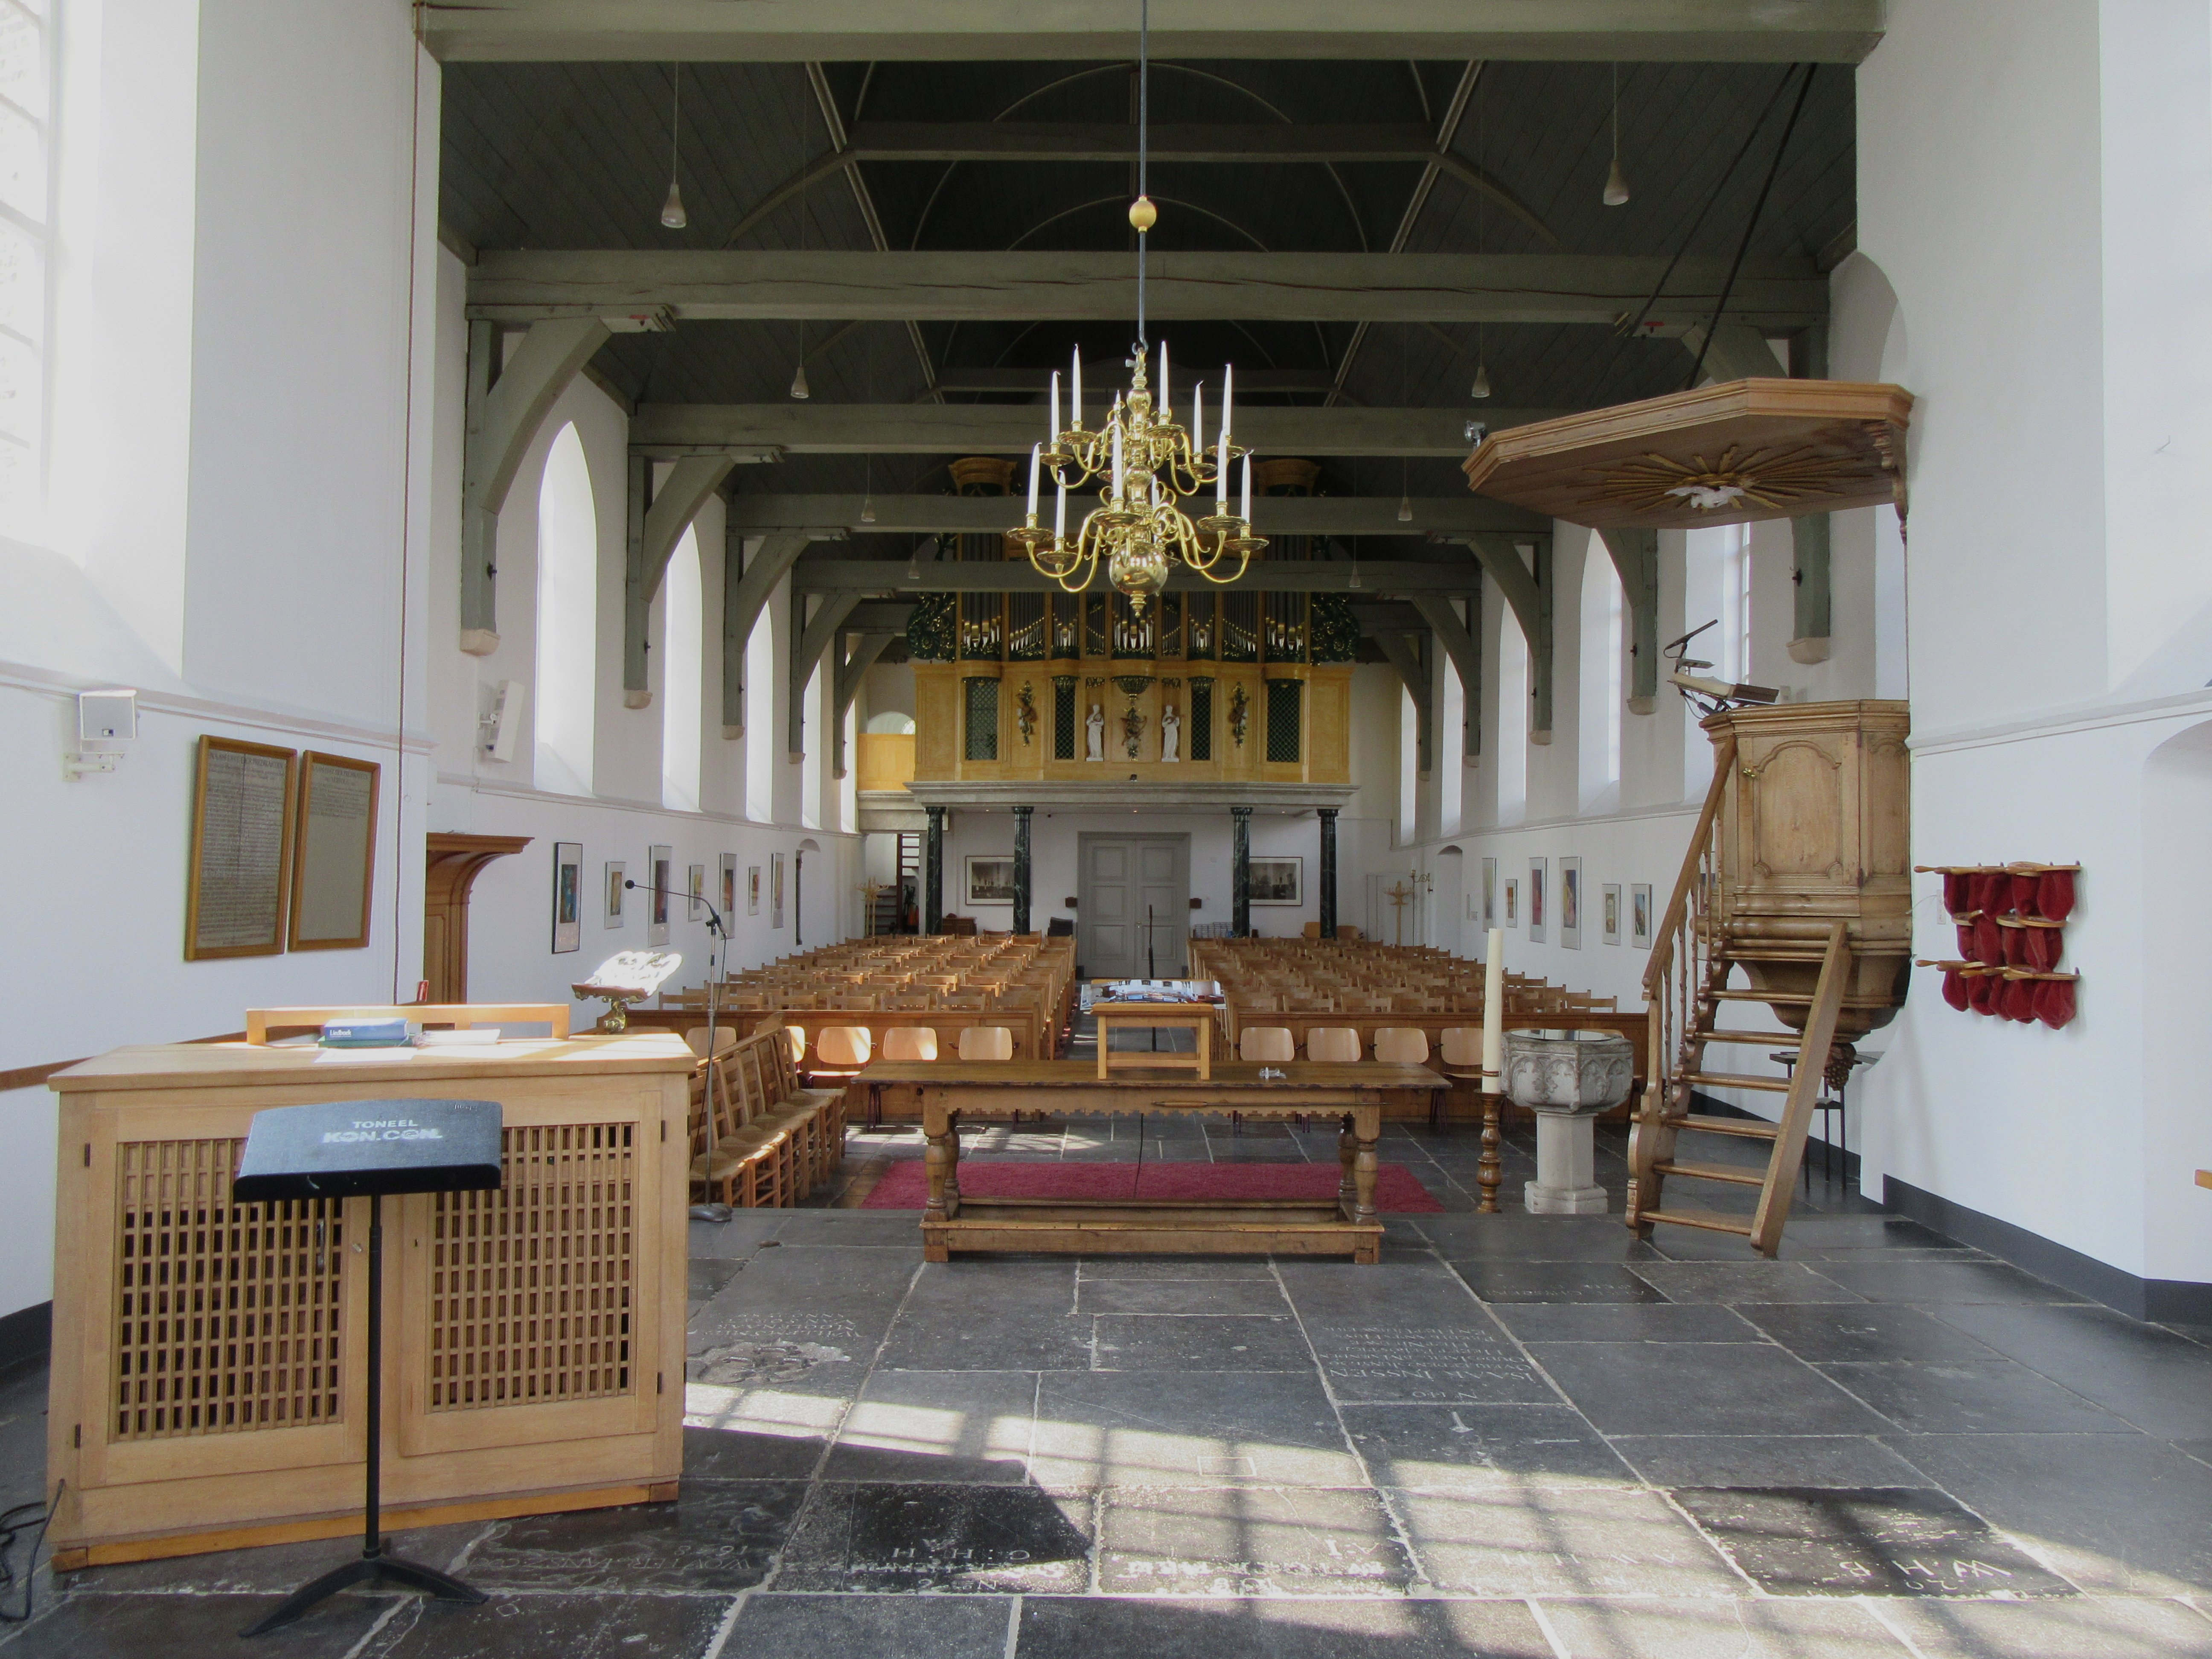 Open Monumentendag in de Oude Kerk